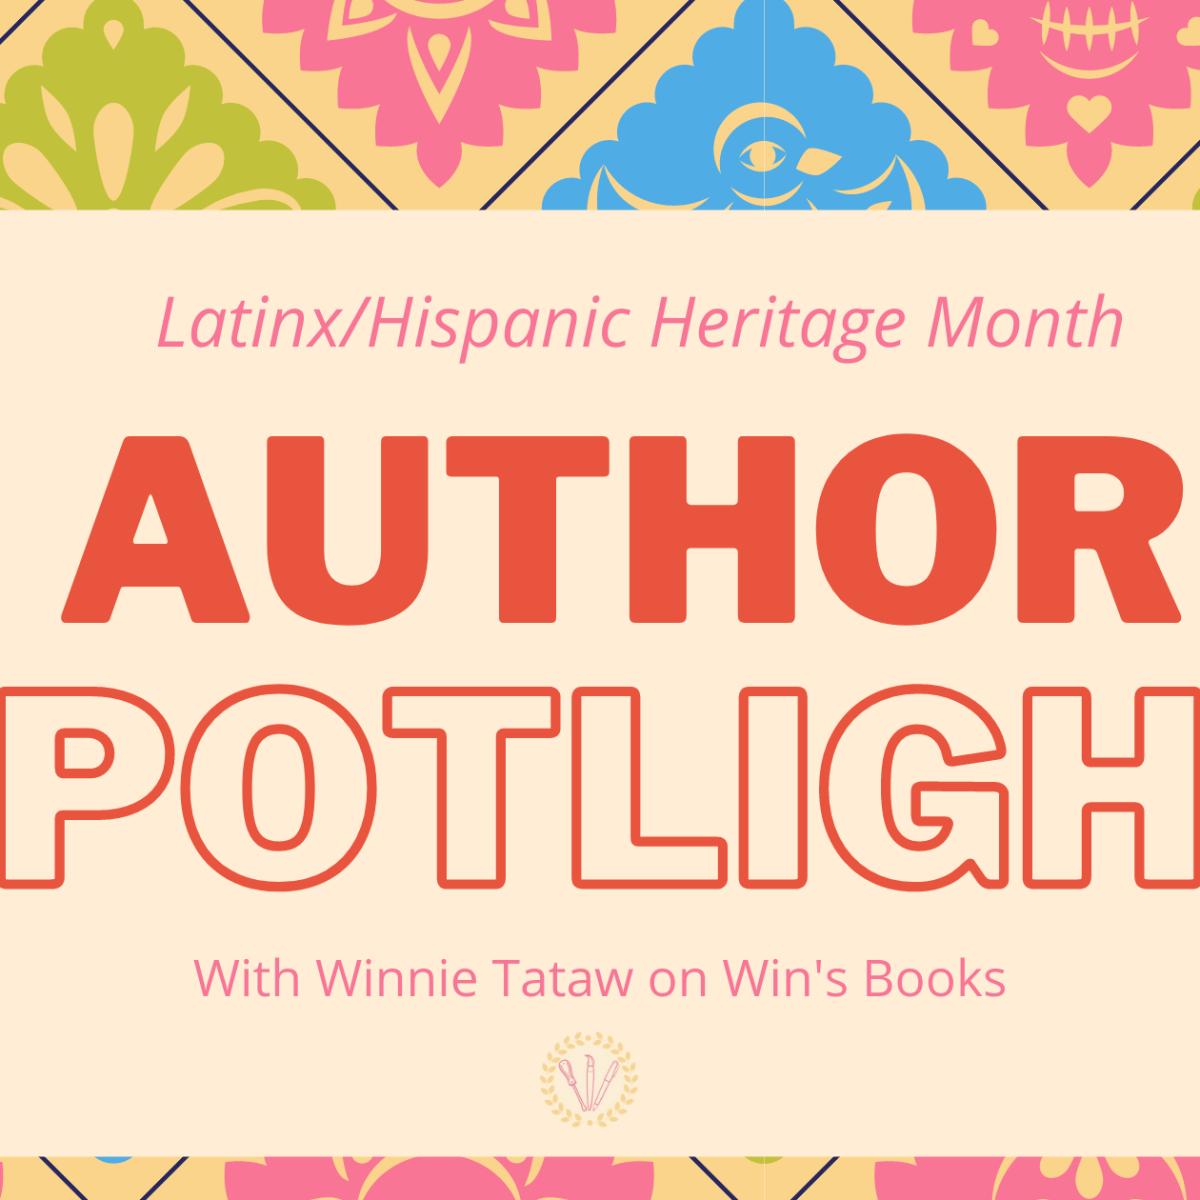 Latinx/Hispanic Heritage Month Author Spotlight on Win's Books